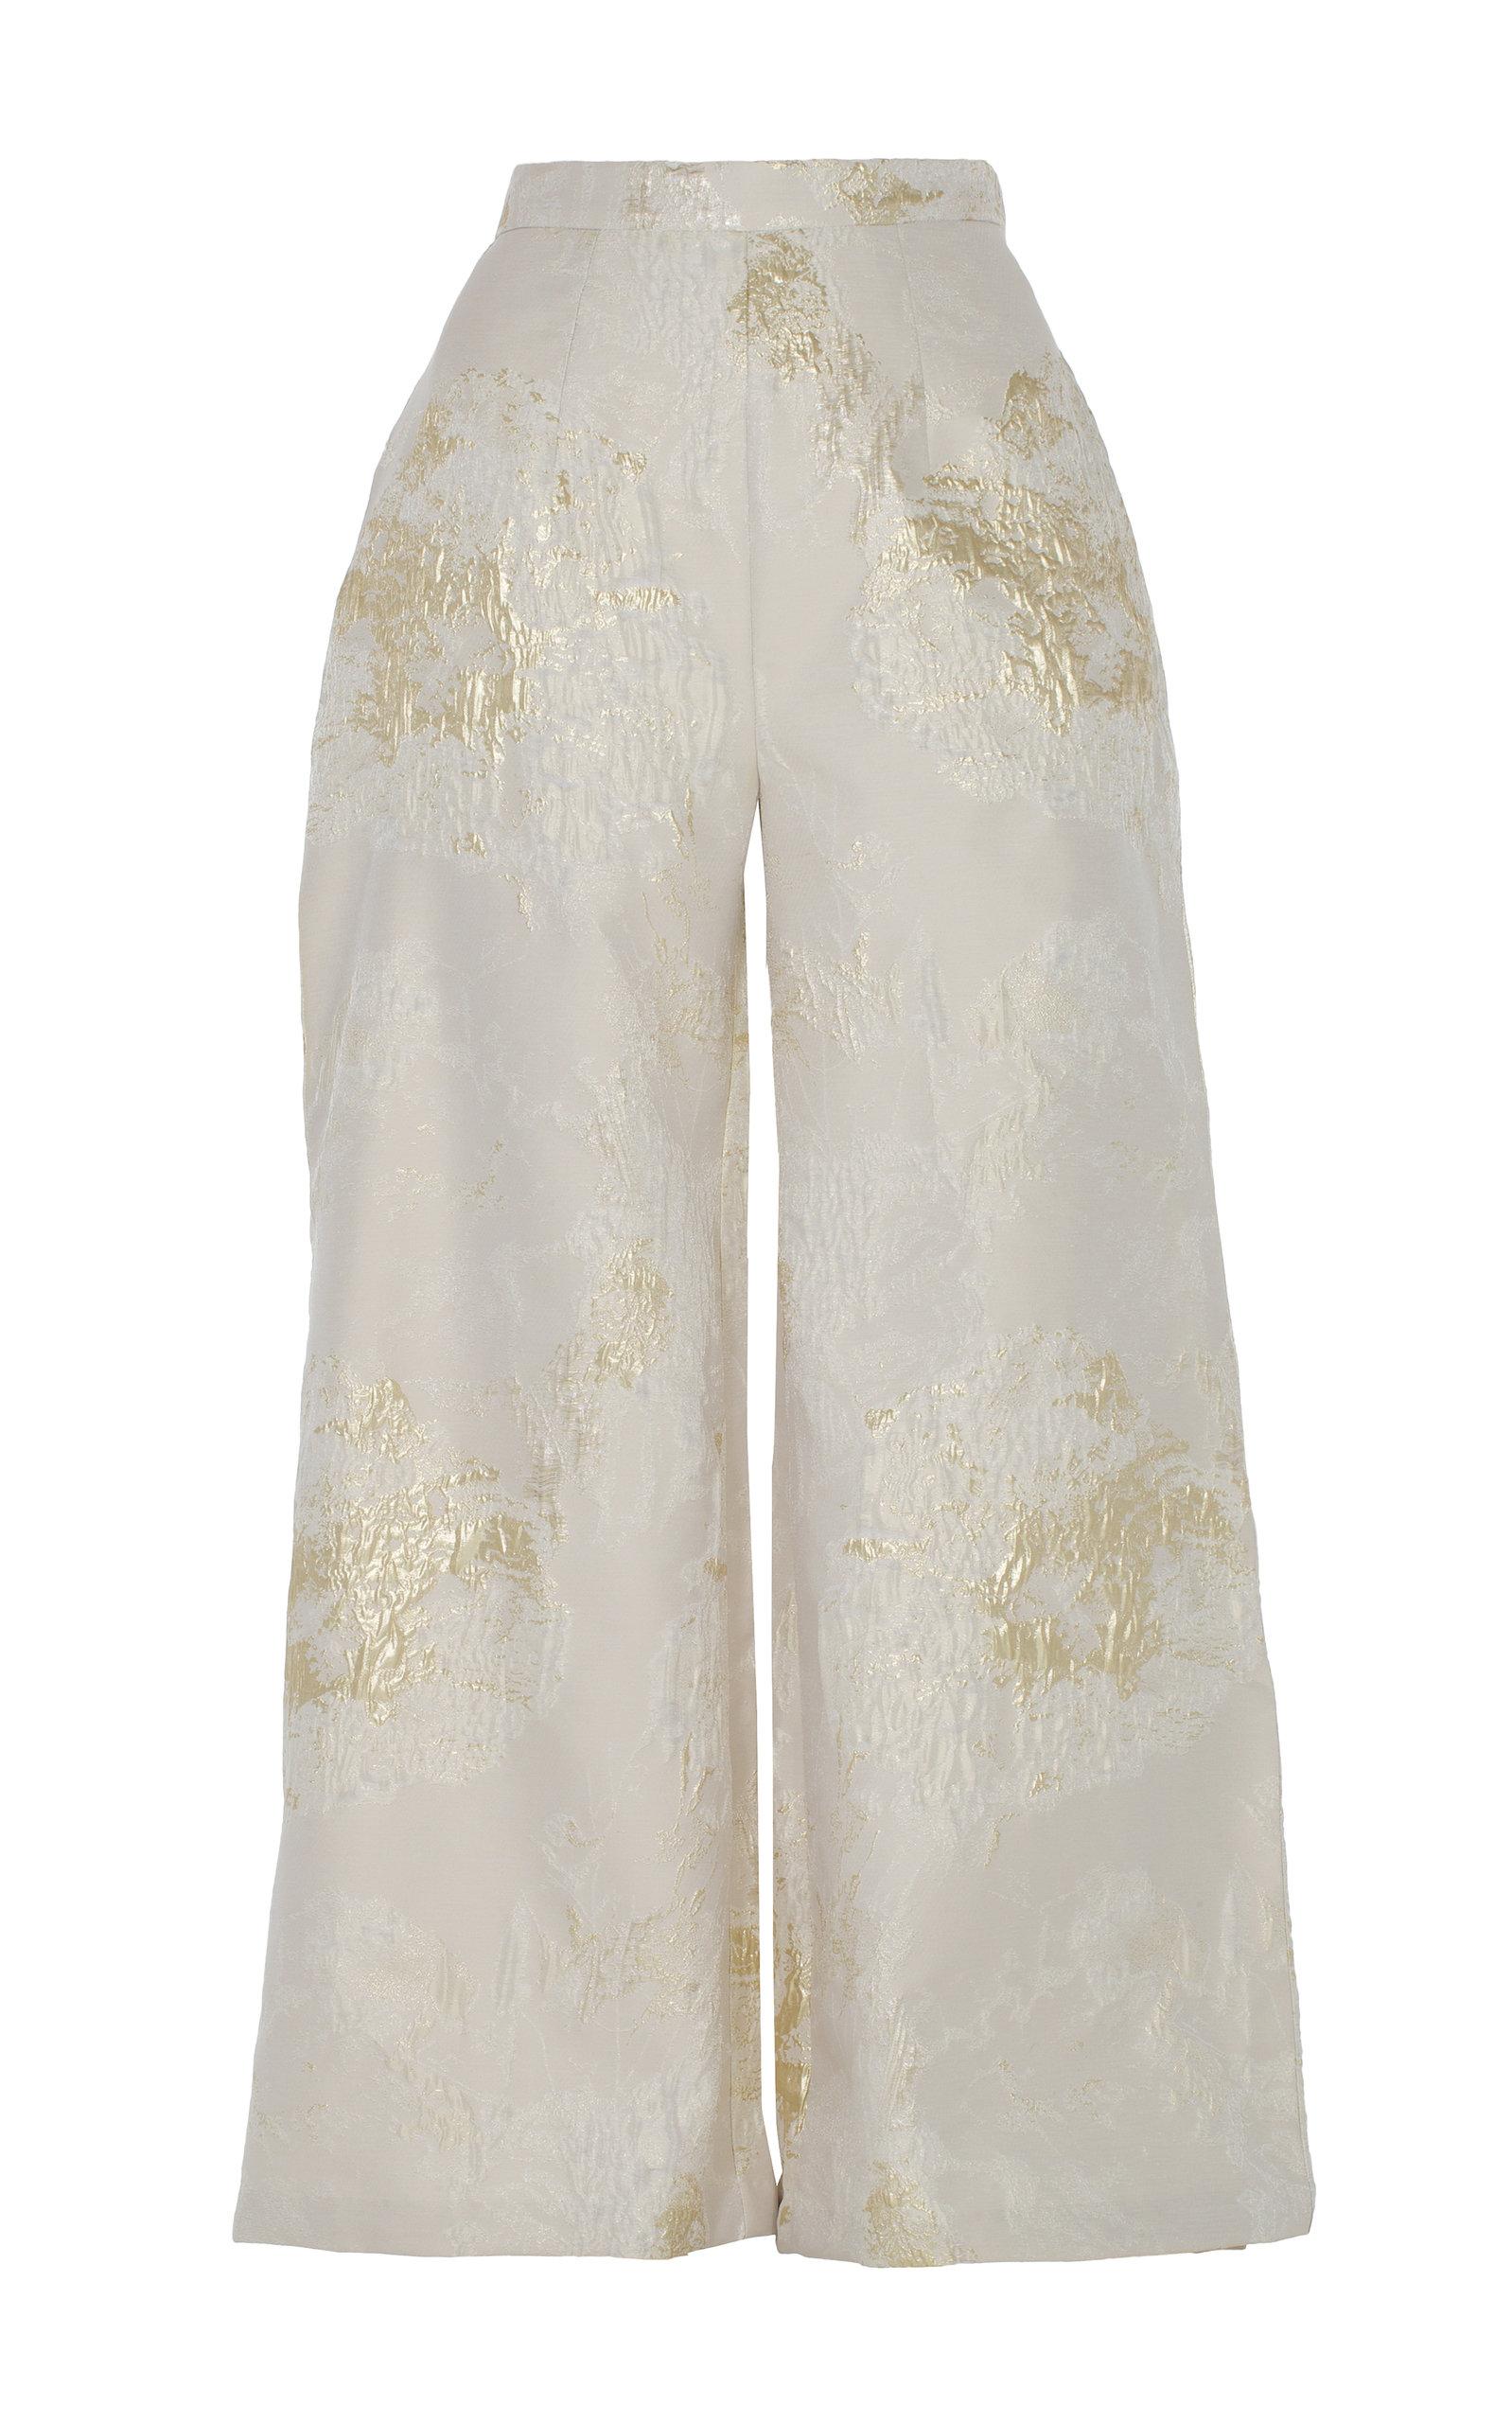 ANATOMI Brocade Iii High Waisted Pants in Gold